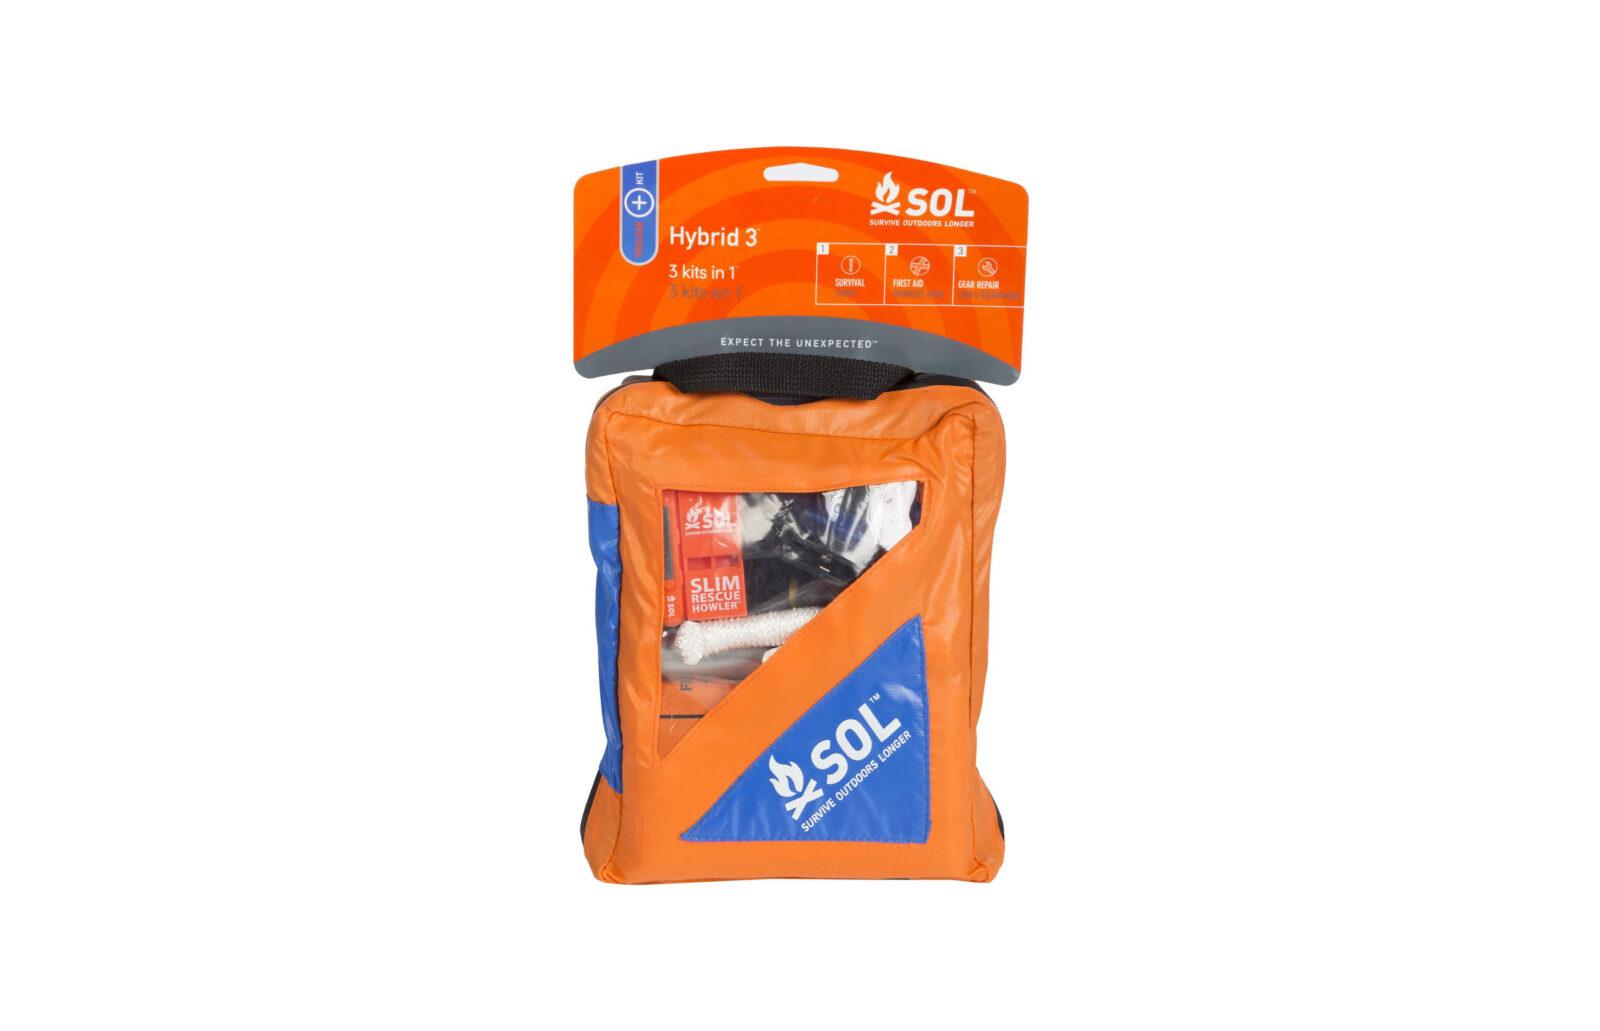 Klim SOL Hybrid 3 Kit - A 3-In-1 Motorcyclist Survival/First Aid/Repair Kit